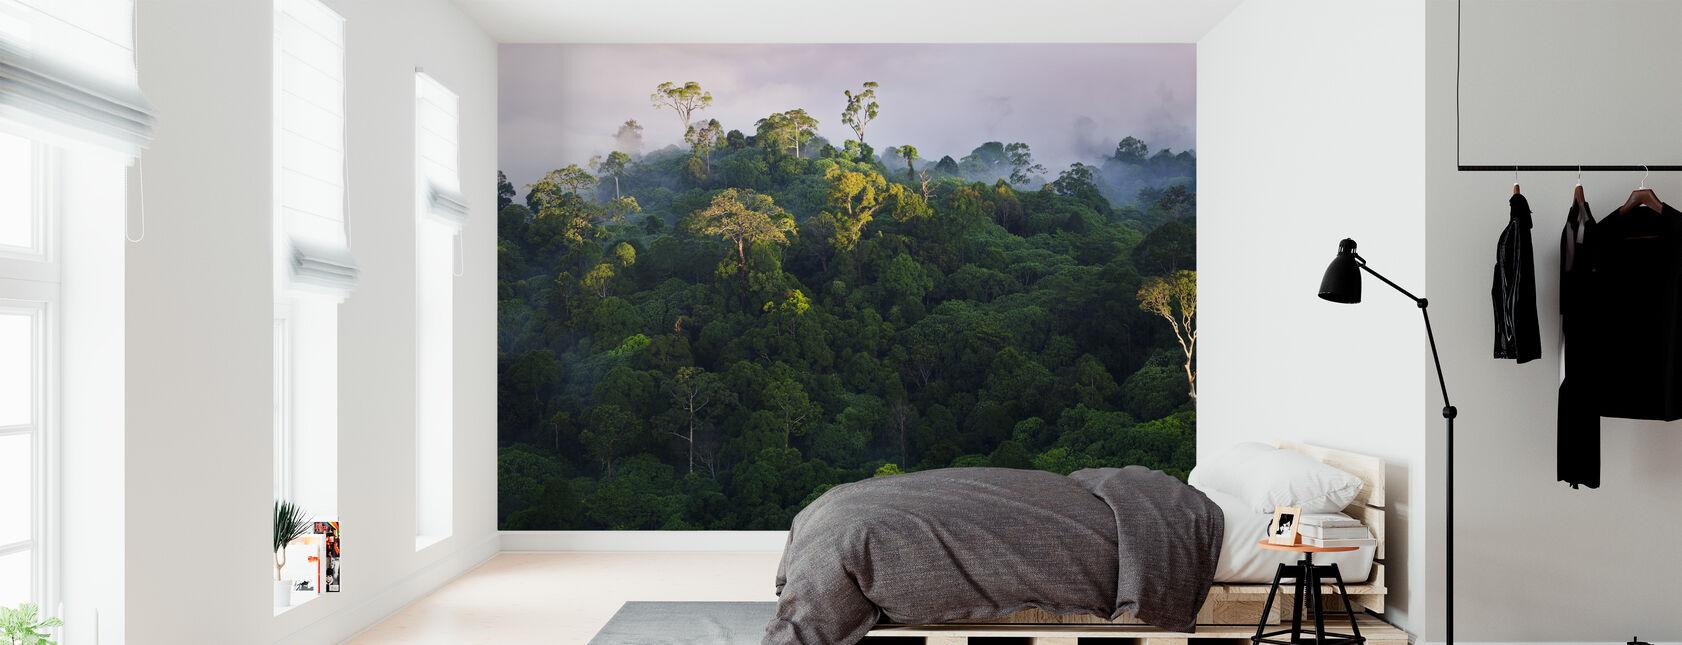 Zonsopgang bij Lowland Rainforest - Behang - Slaapkamer